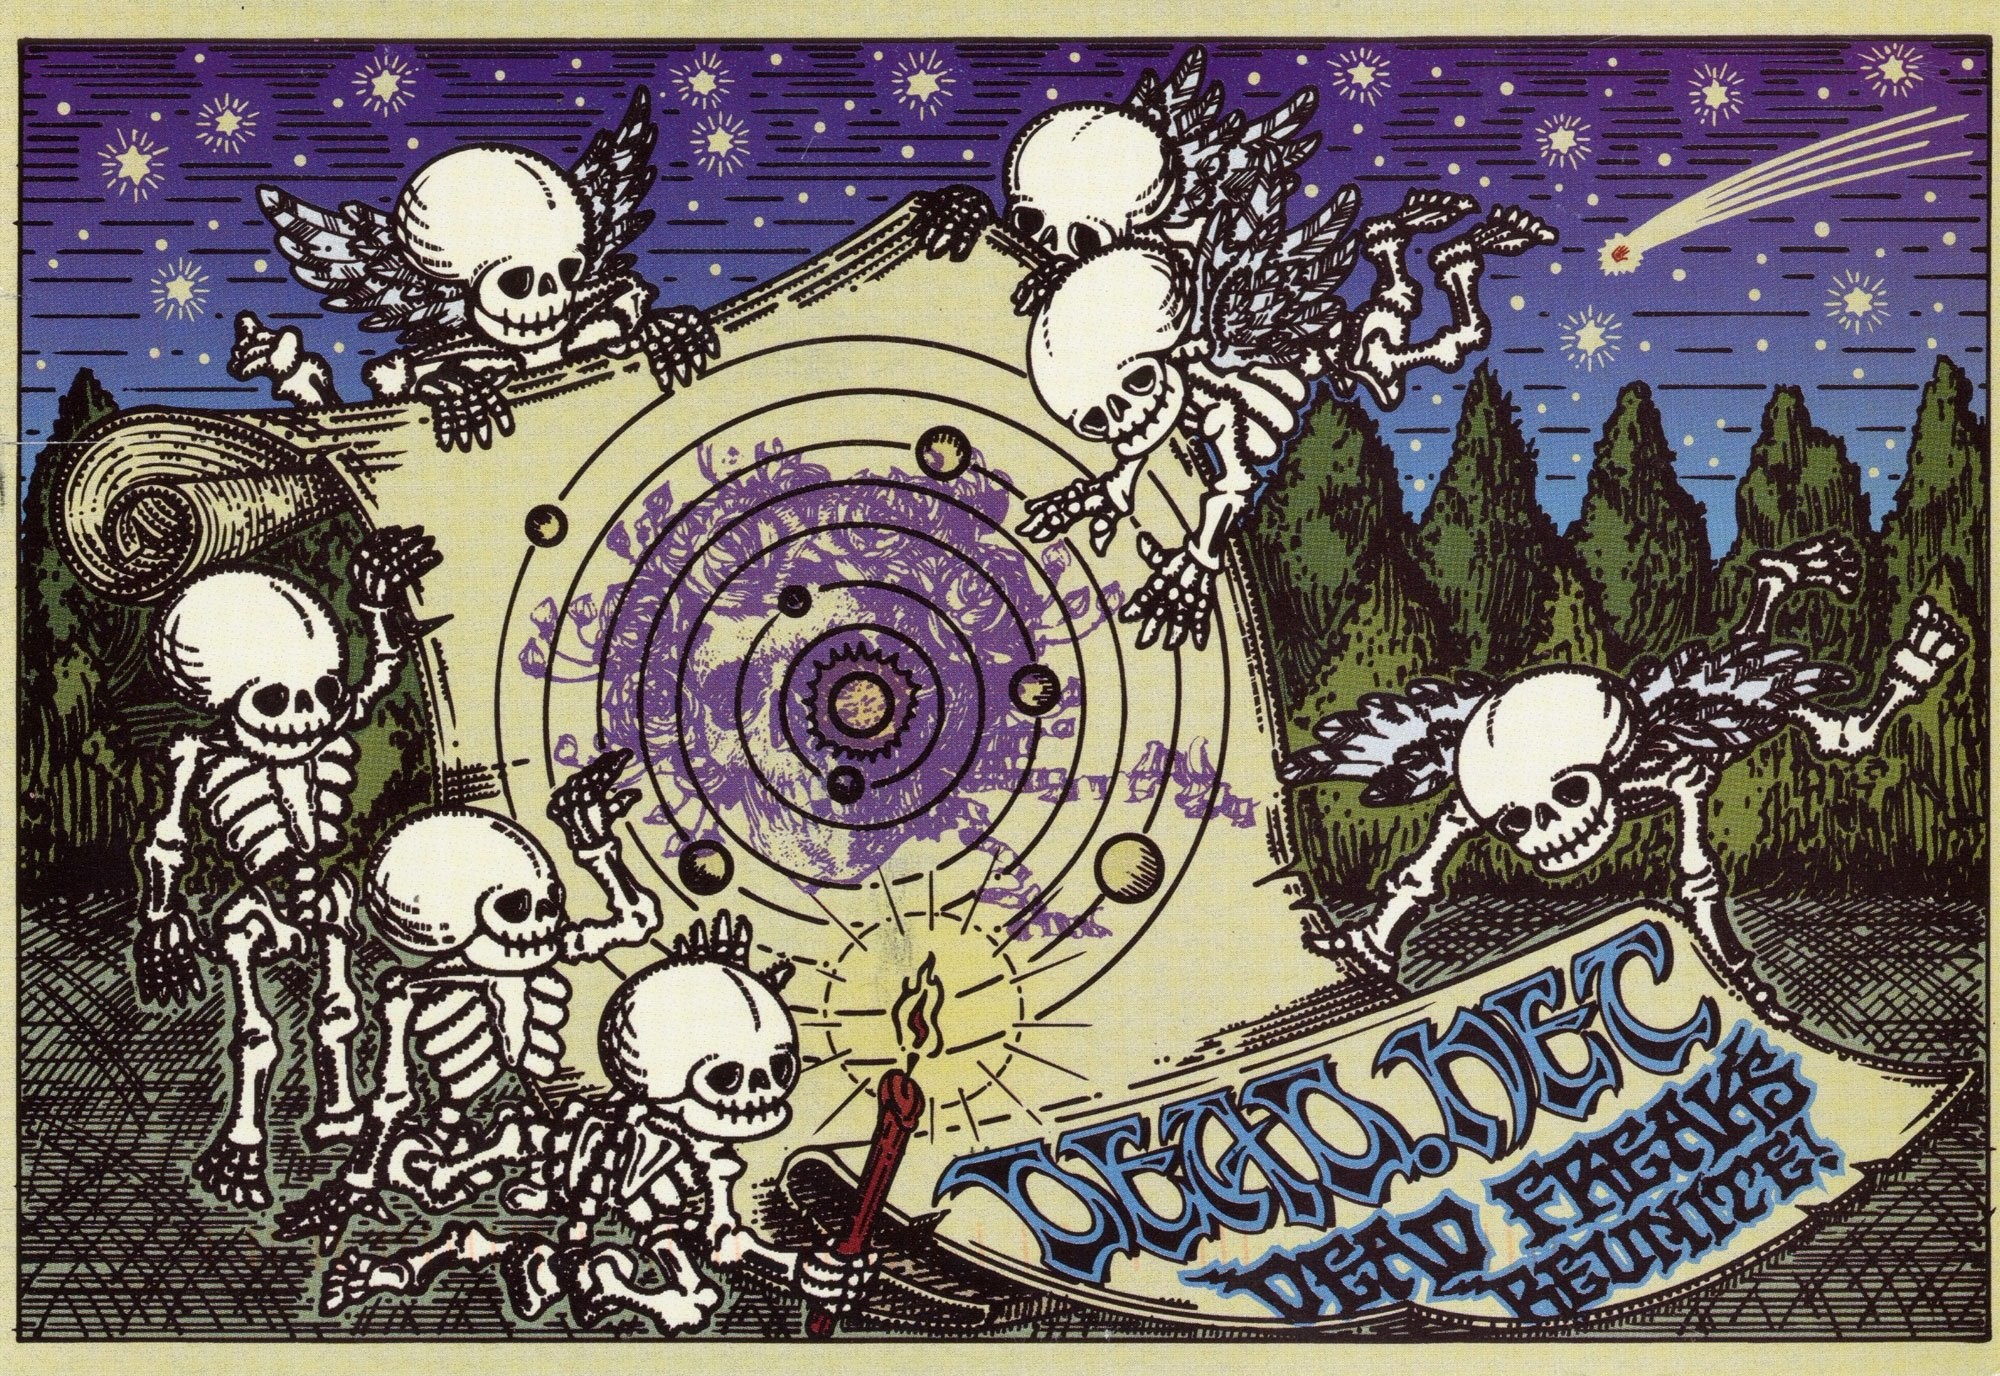 Grateful Dead Desktop Wallpaper: Grateful Dead IPhone Wallpaper (42+ Images